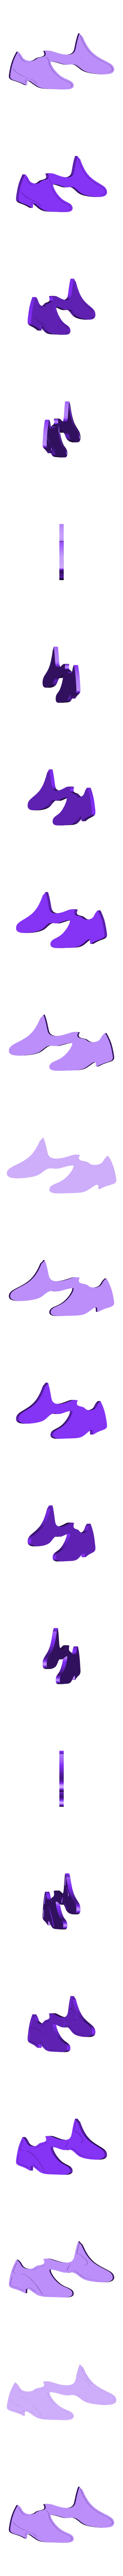 Mn_shoes.stl Download free STL file Metaphor • 3D printing template, JayOmega